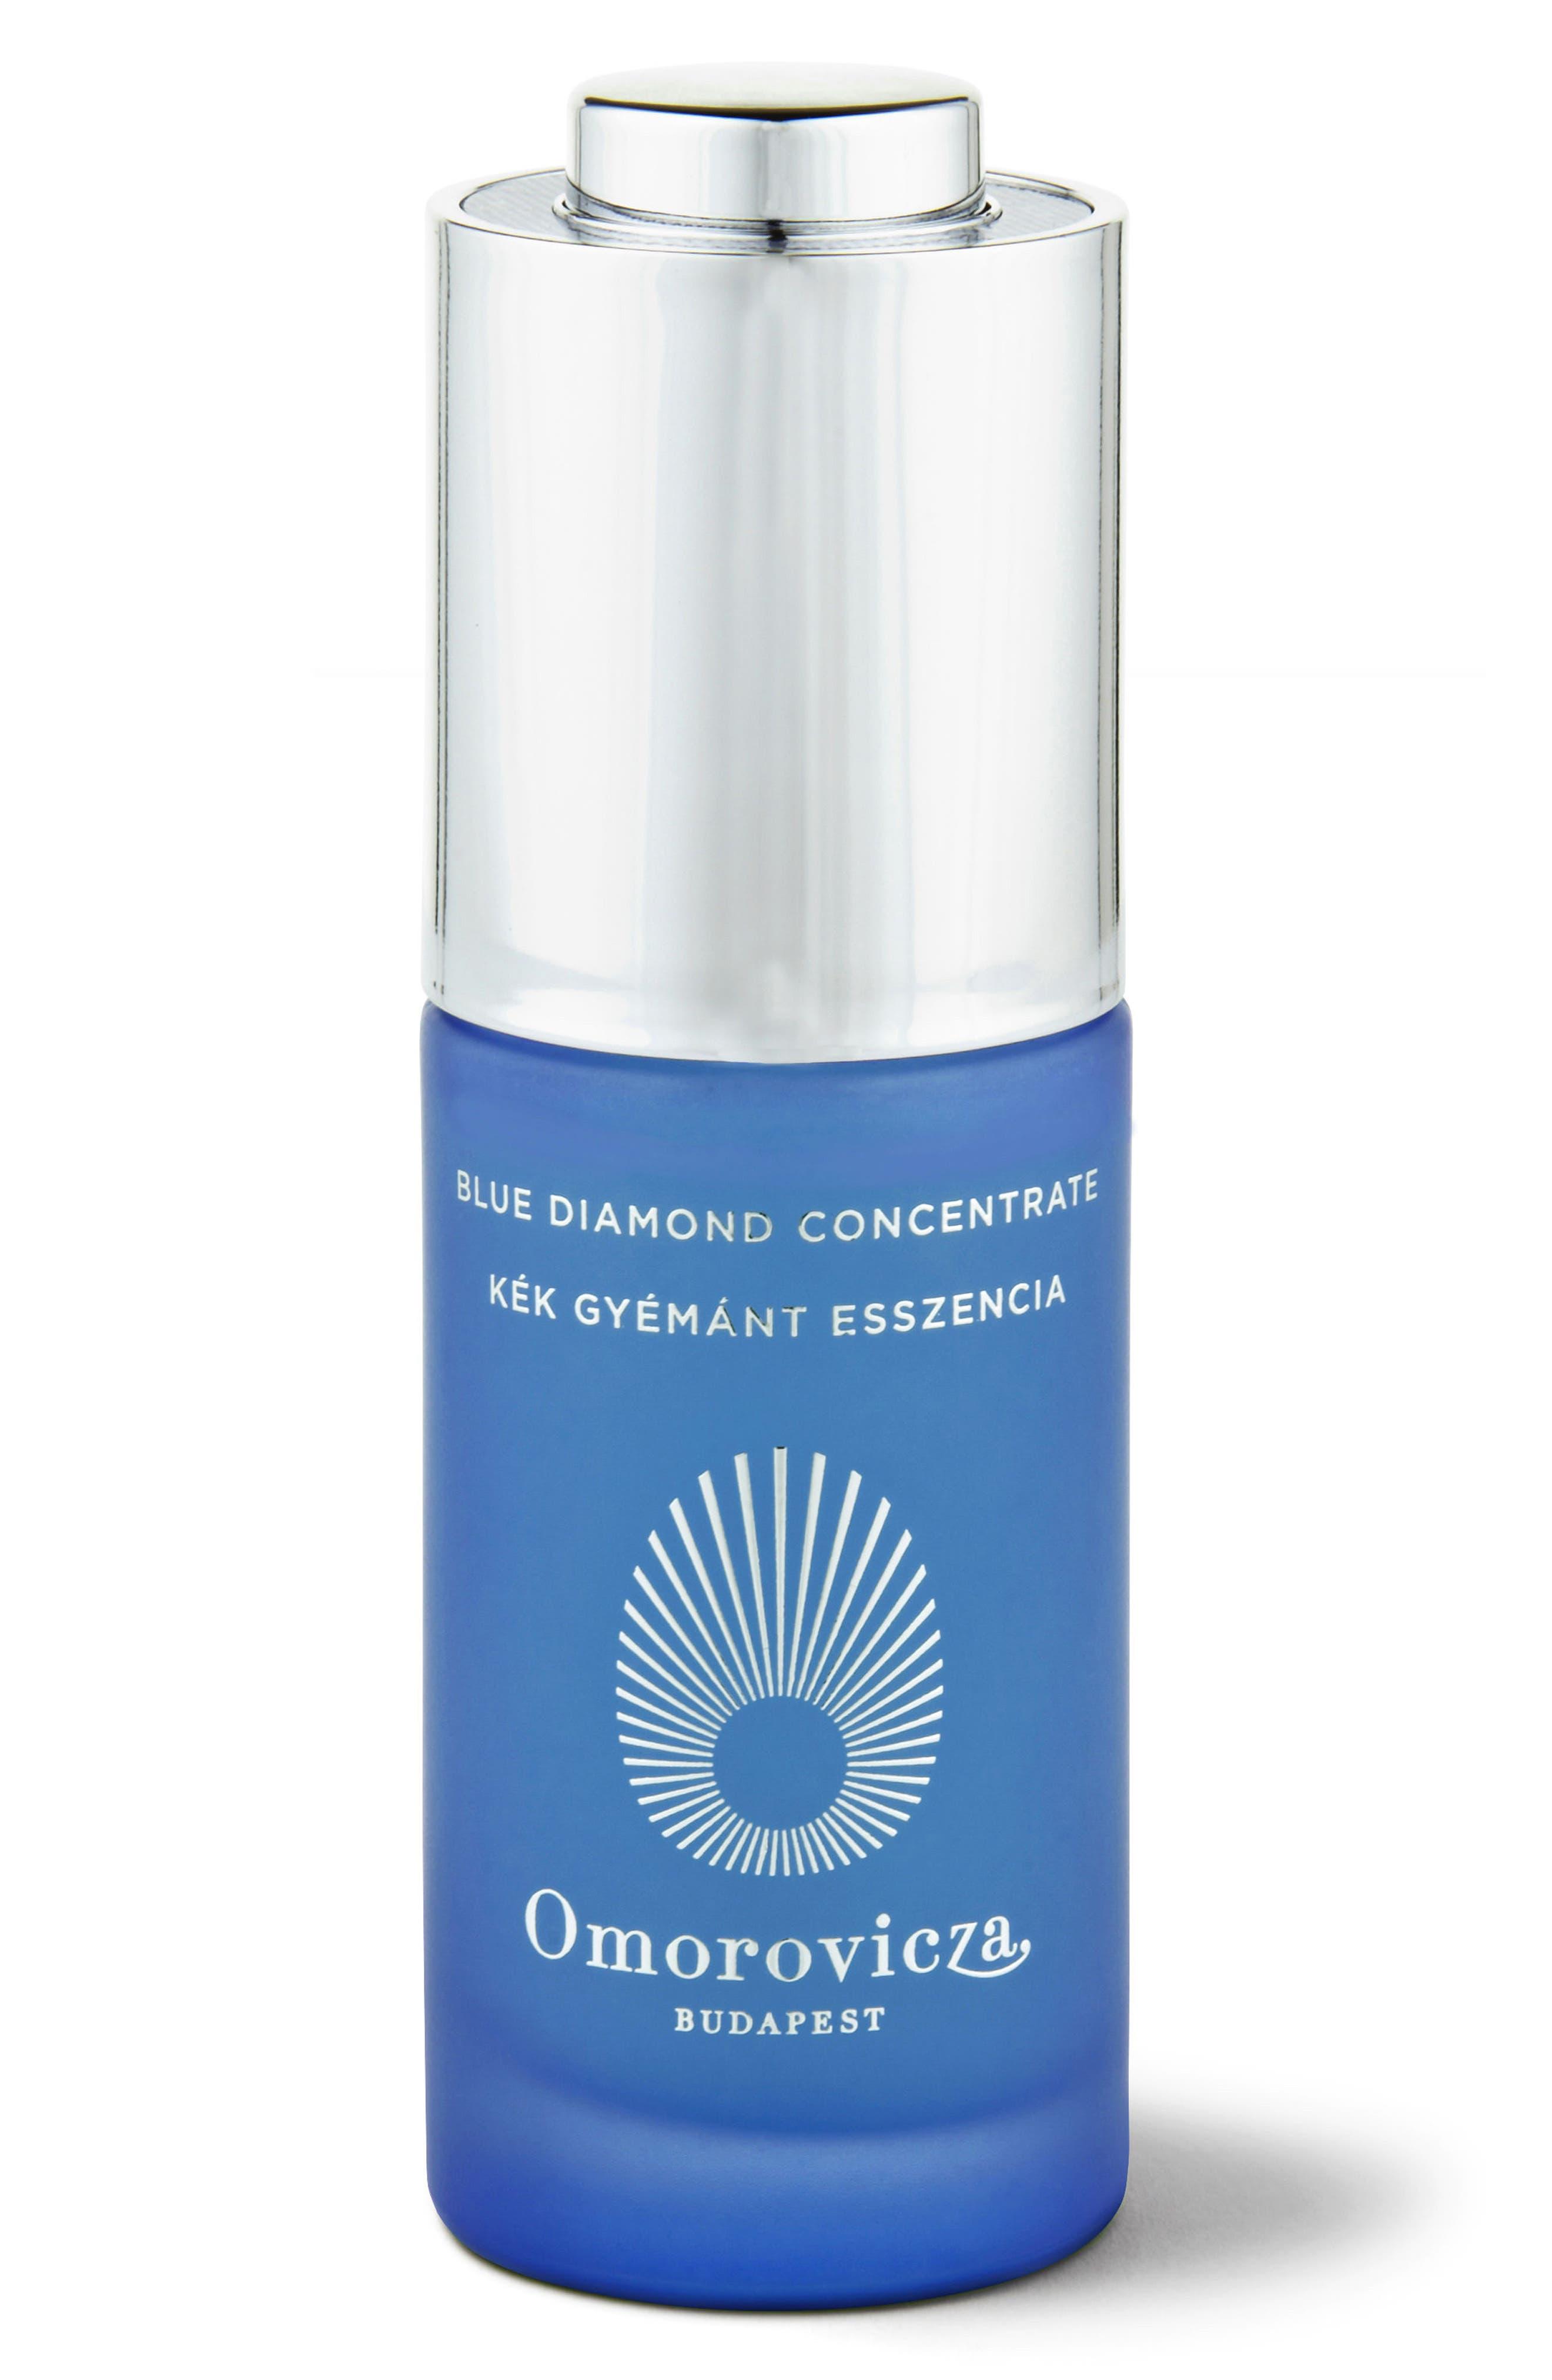 Omorovicza Blue Diamond Concentrate